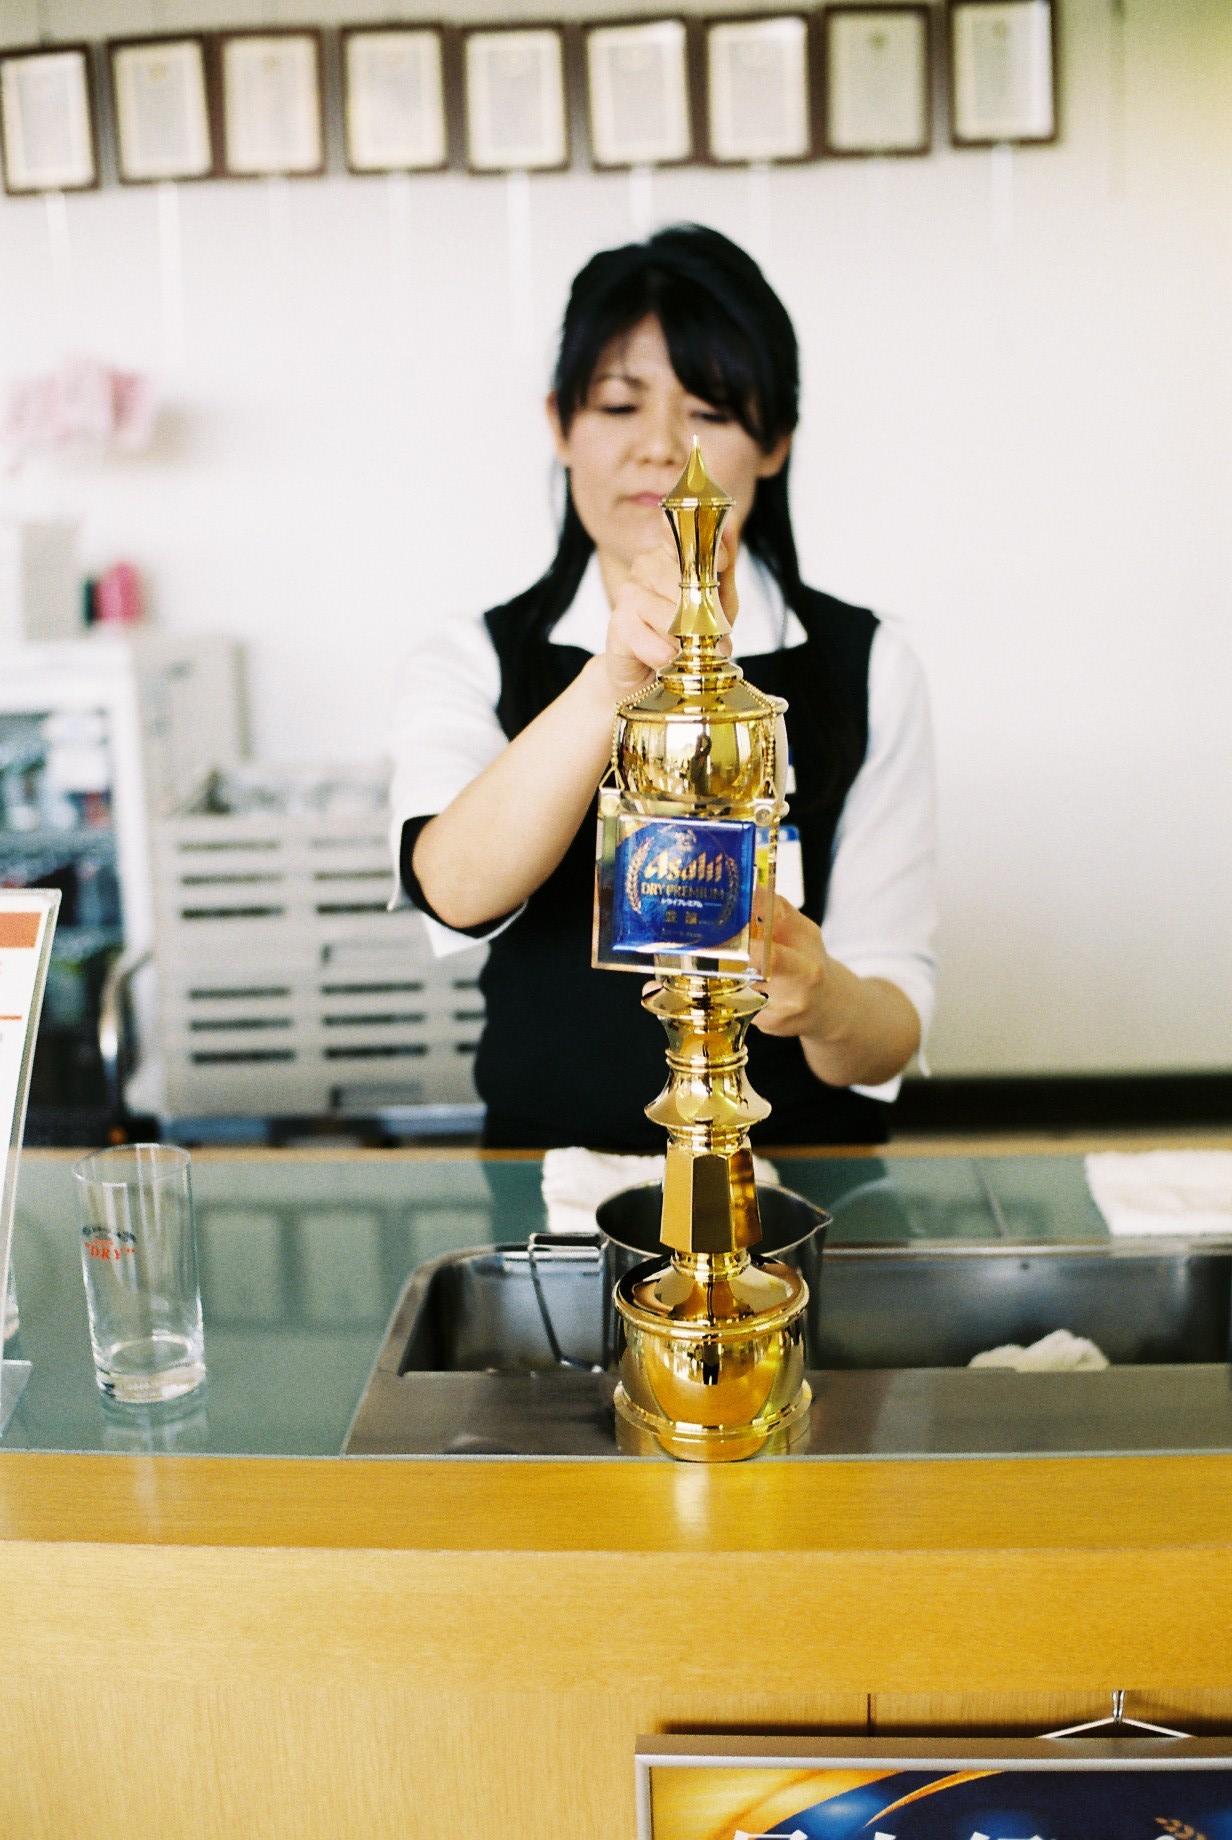 The Second Beer (Preimun Beer)